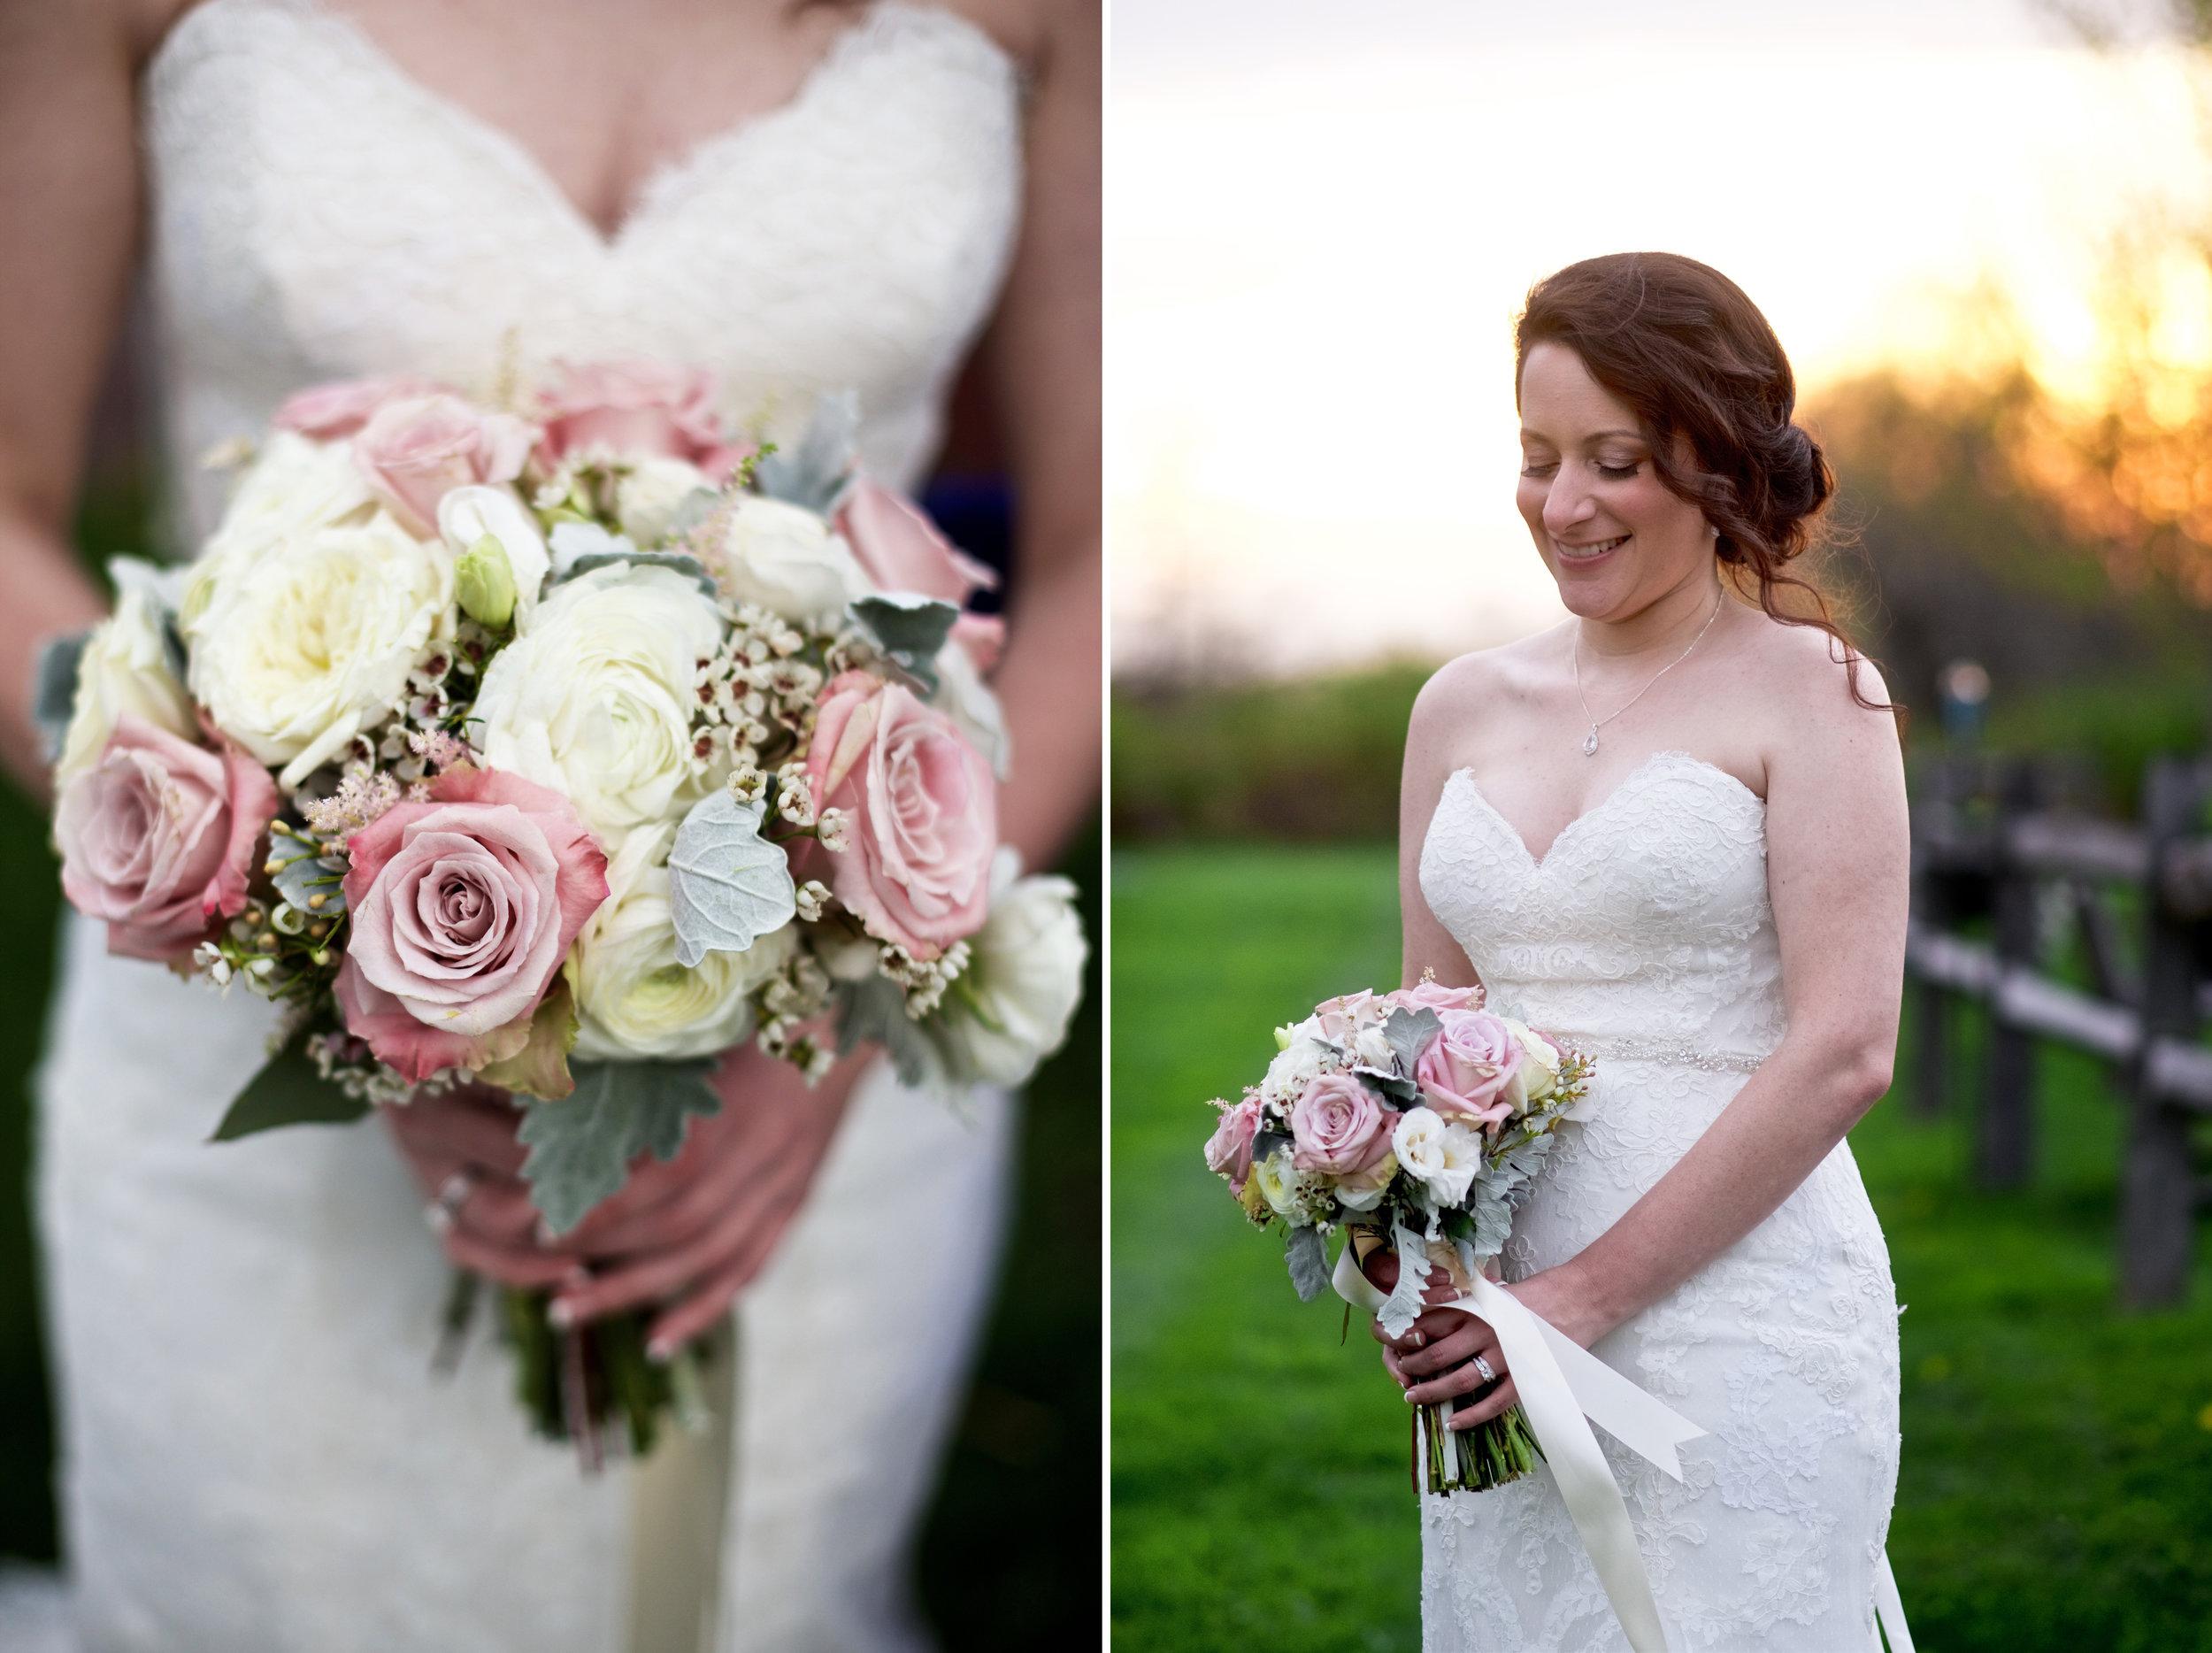 Lippincott manor wedding, wallkill ny wedding, photography, photos ae.jpg